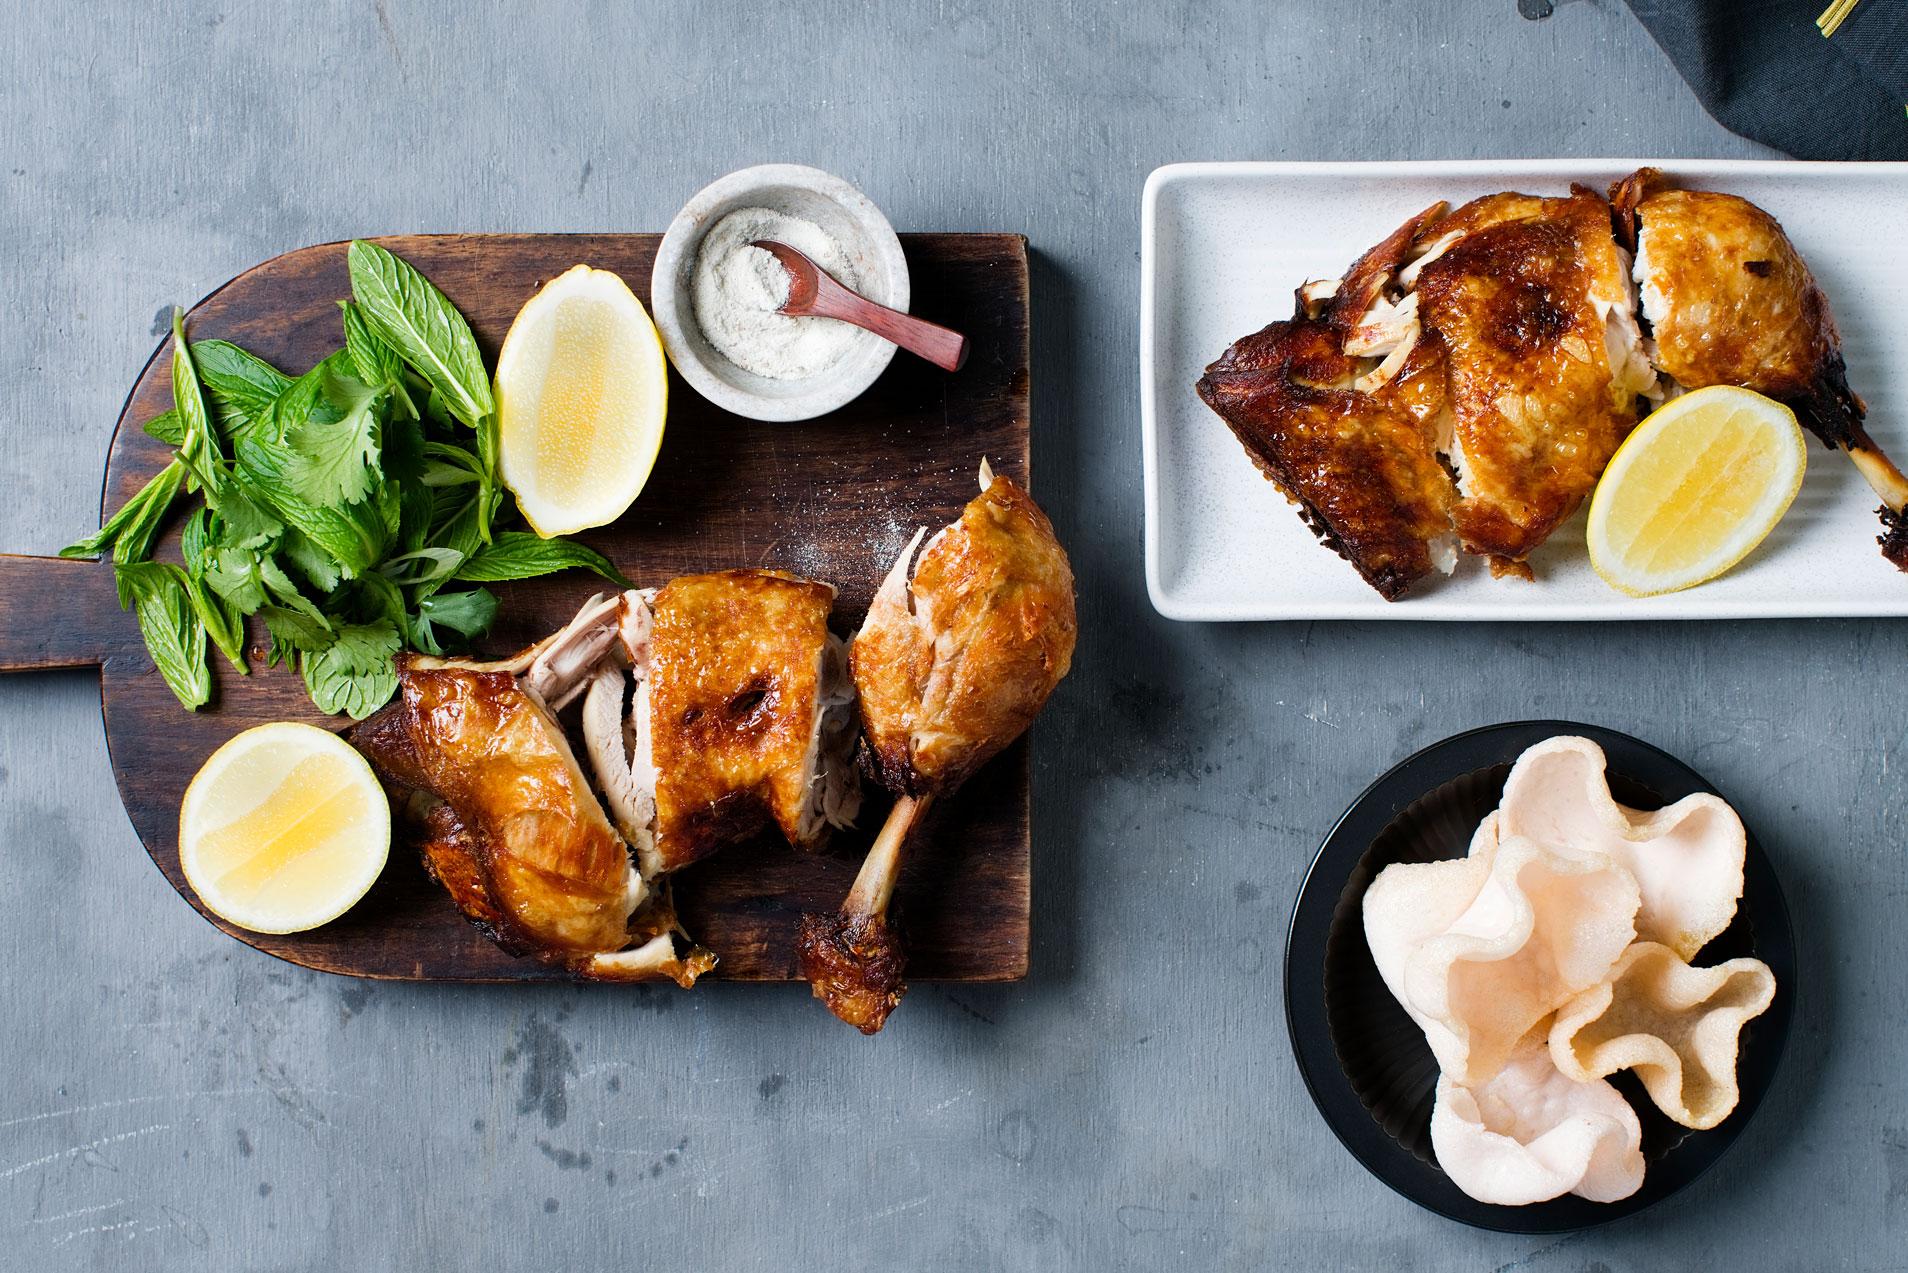 Phuong-Crispy-Skin-Chicken-CROPPED.jpg